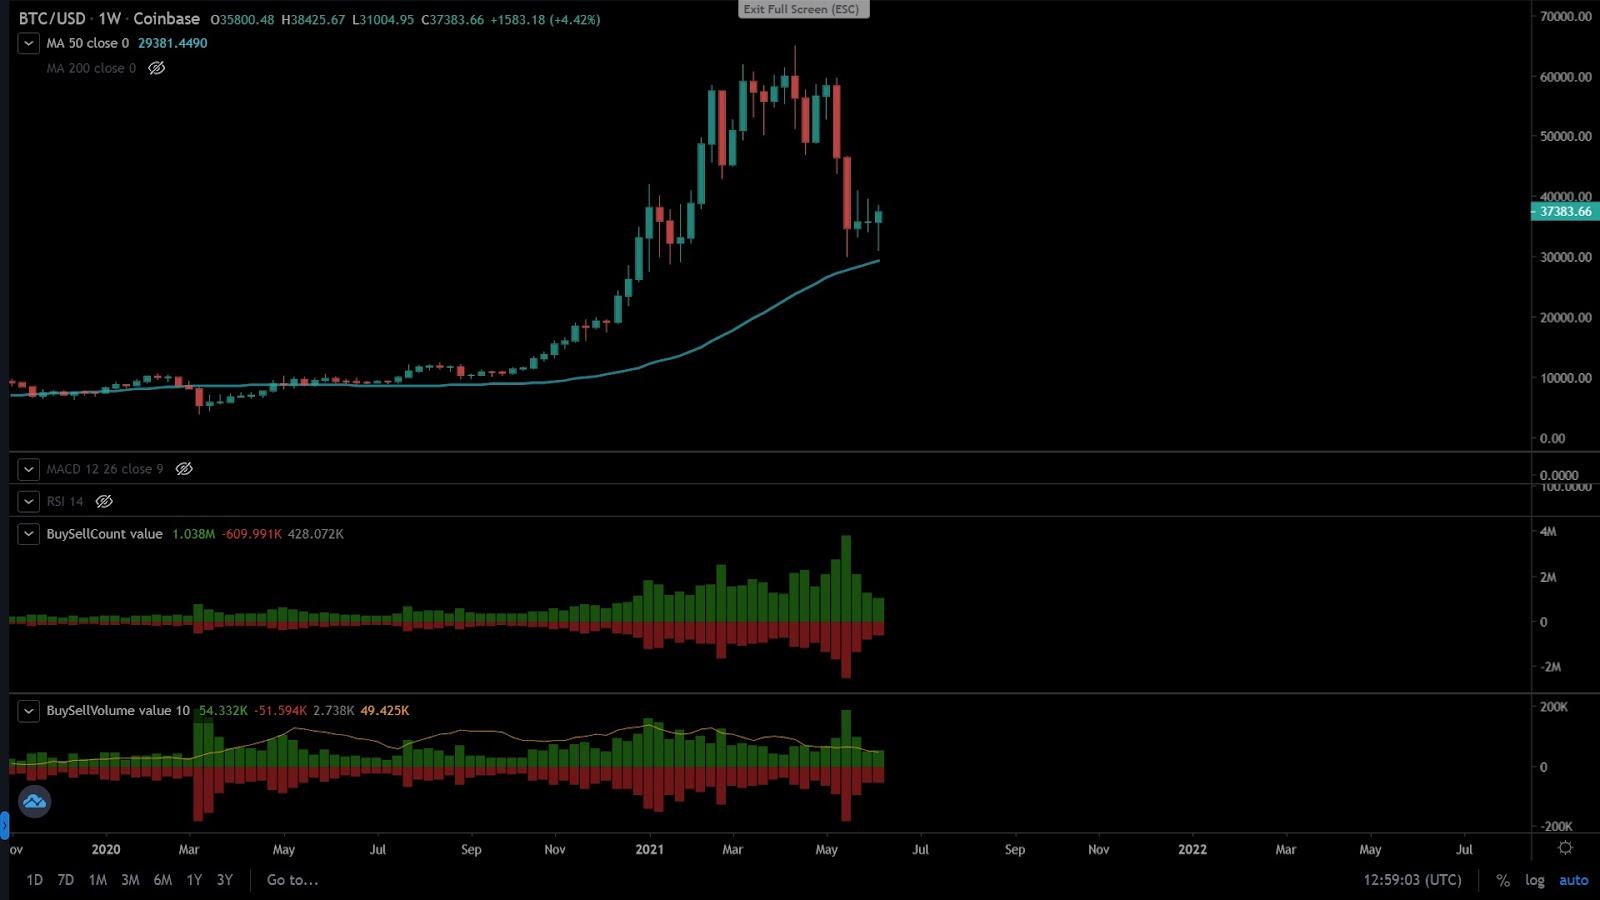 Buy/Sell Analysis